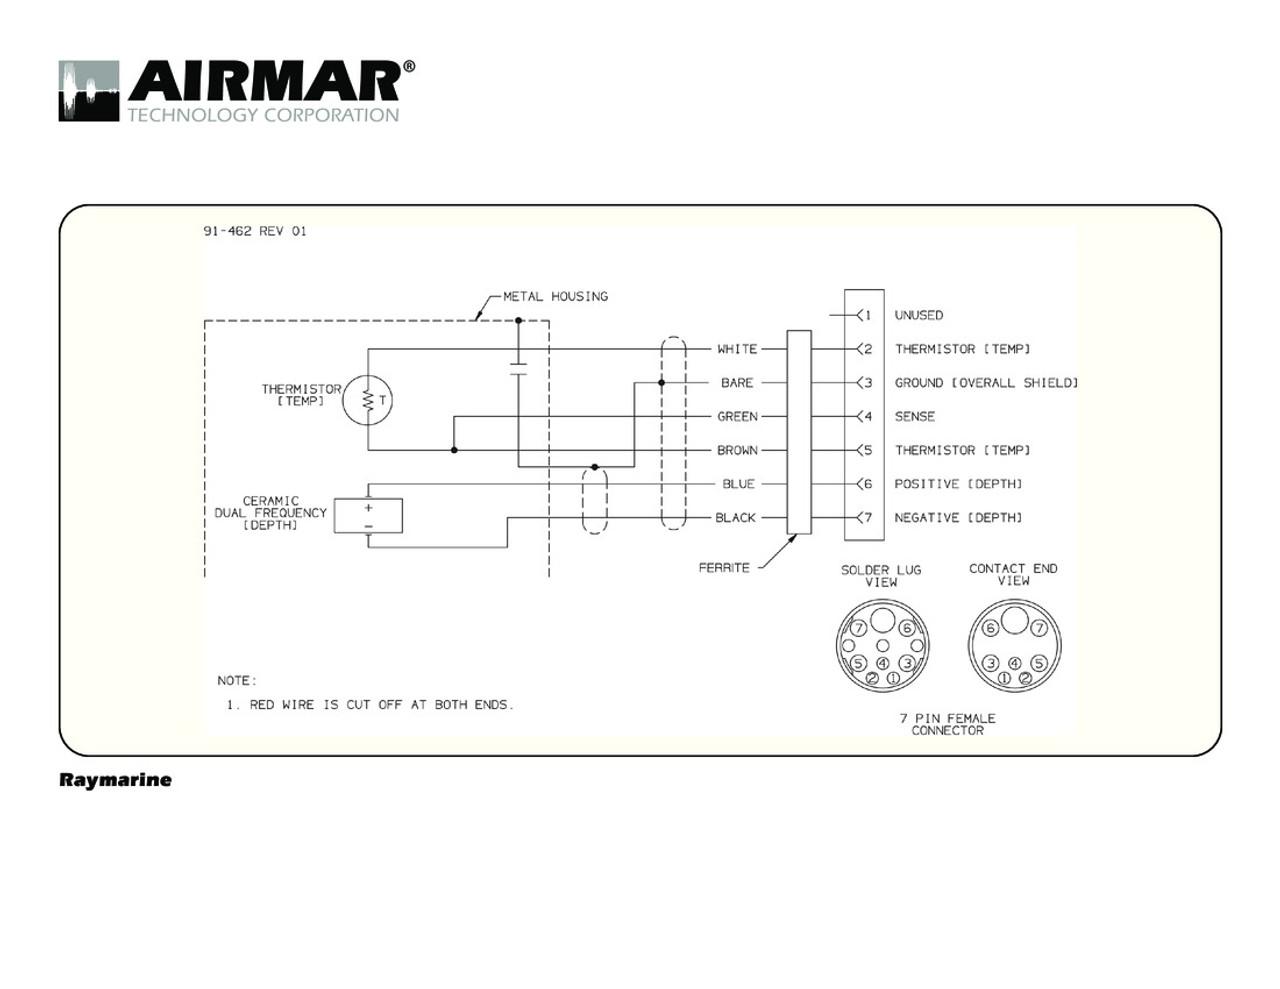 Airmar Wiring Diagram Raymarine 7 pin (D,T) | Blue Bottle Marine on 7 pin electrical, sae j1850 pin diagram, 7 pin connector diagram, 7 pin power supply, 7 pin battery, 7 pin controller diagram, 7 pin cable, 7 pronge trailer connector diagram, 7 pin relay diagram, 7 pin coil, 7 pin trailer diagram, 7 pin regulator, 7 pin cover, 7 pin ford, 7 pin plug diagram, 7 prong trailer plug diagram,